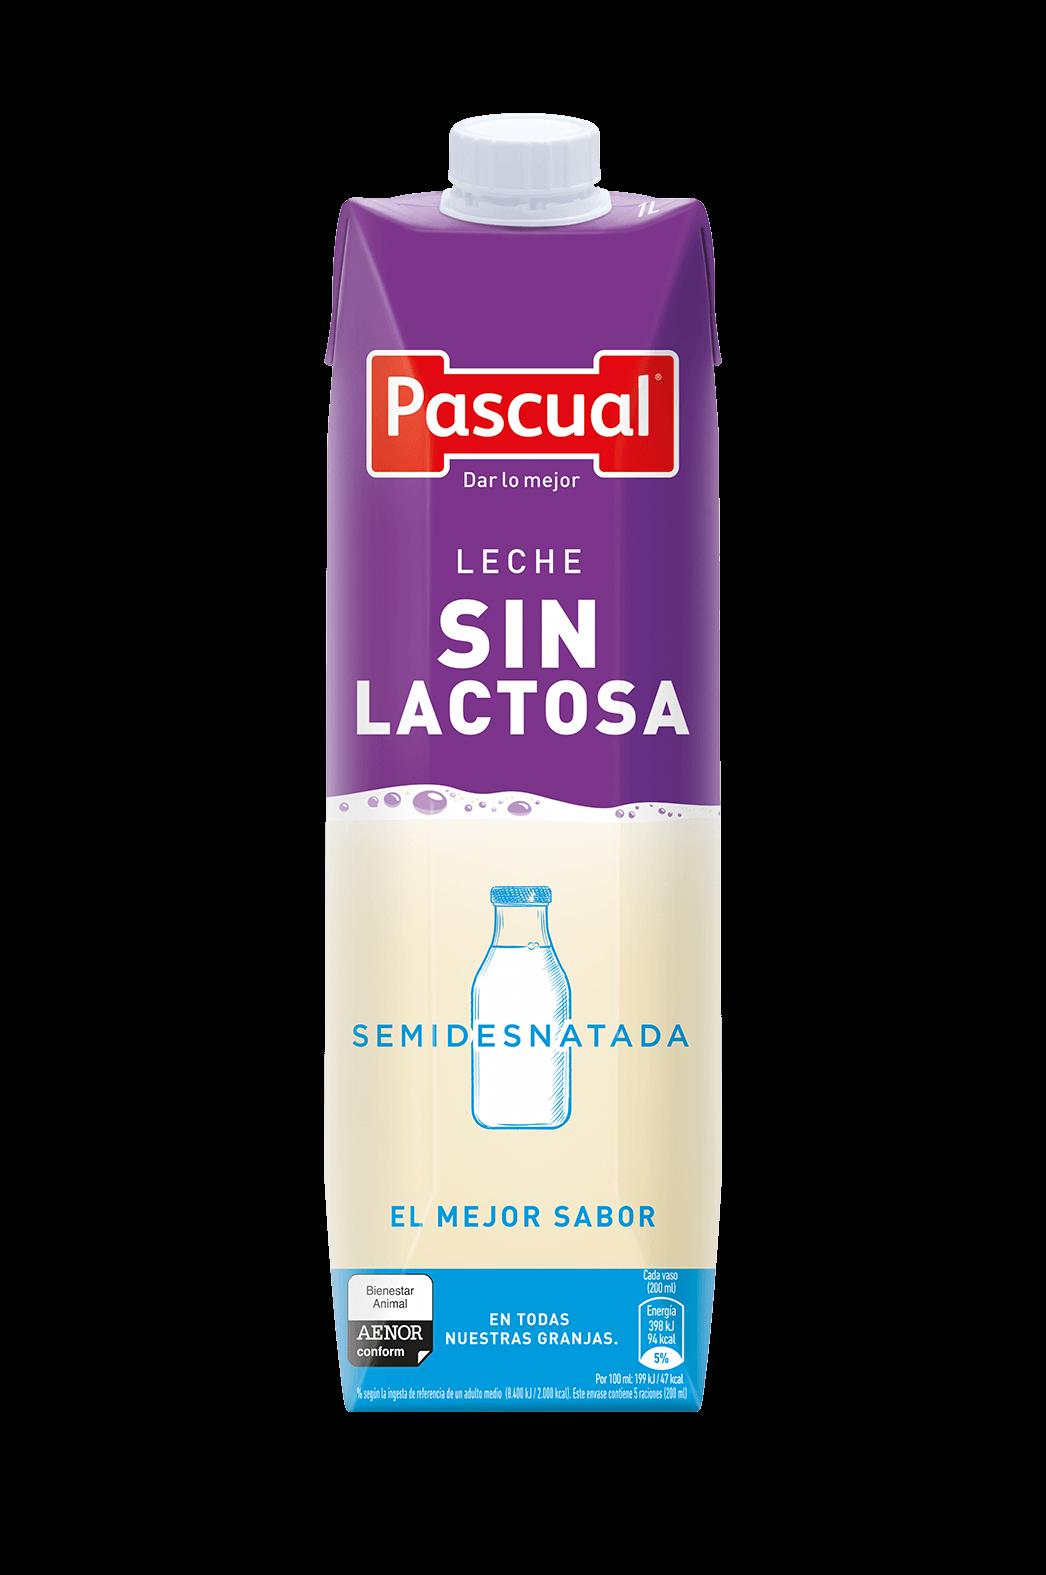 Leche Sin Lactosa Semidesnatada - Leche de Bienestar Animal